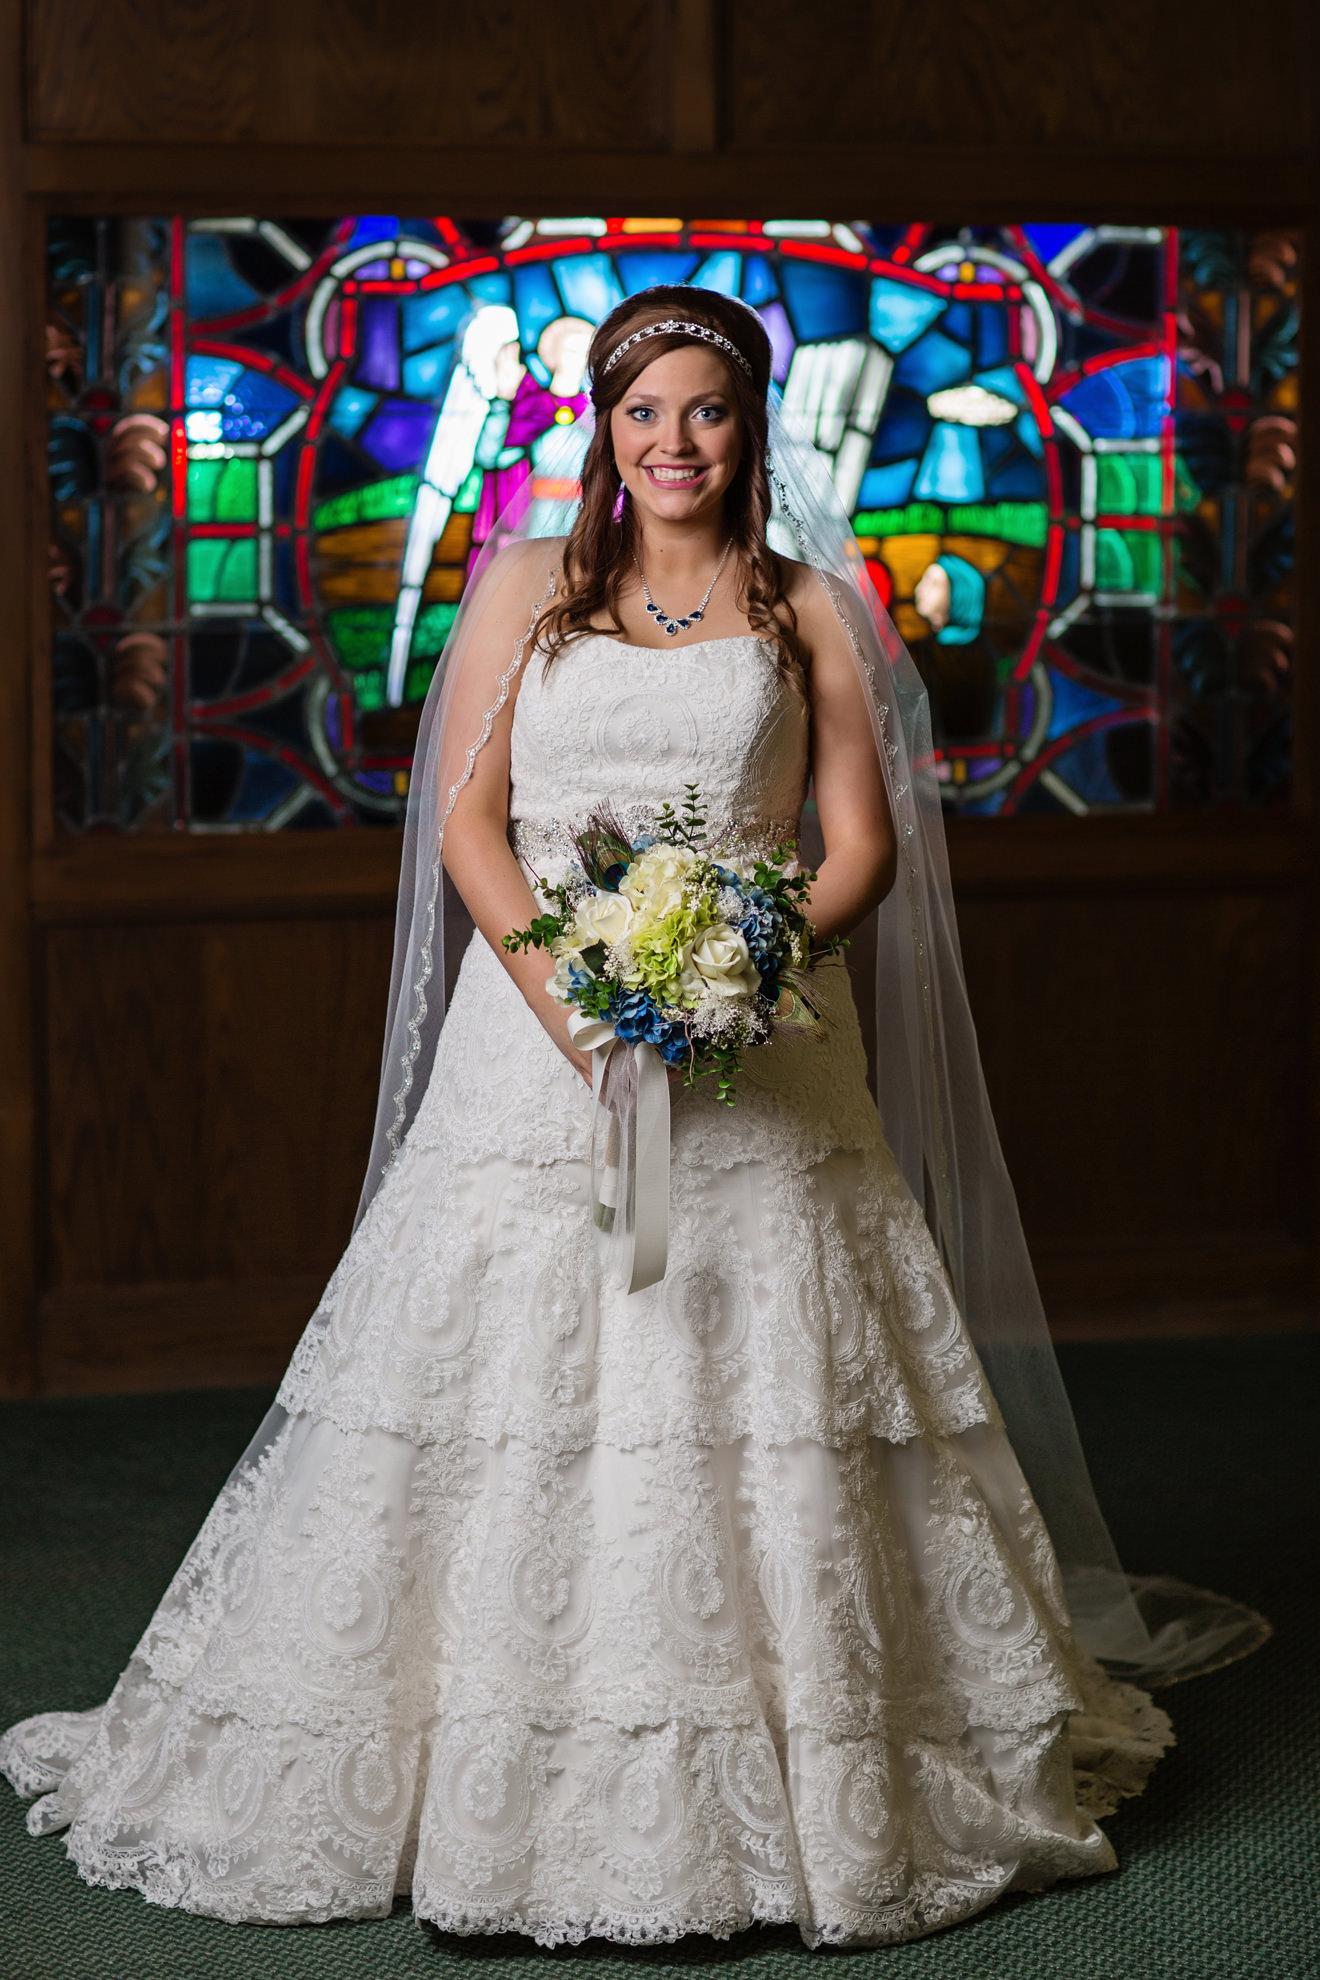 amarillo-wedding-dress-photos-2.jpg